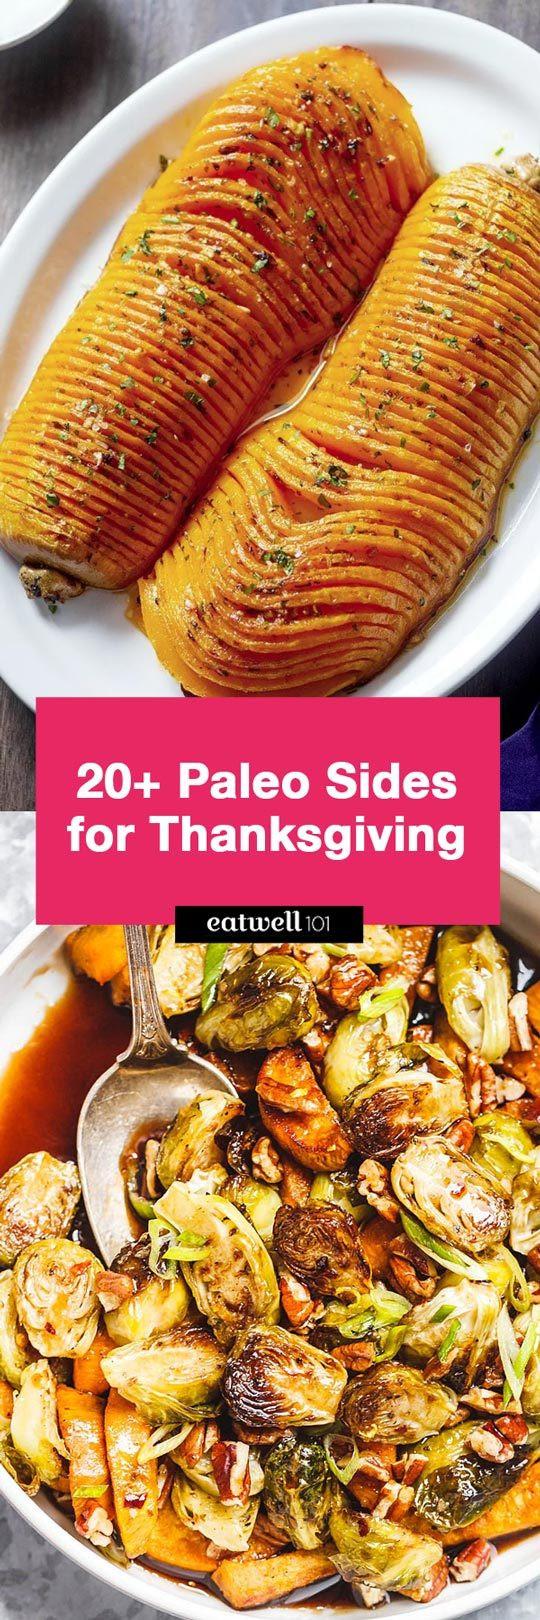 Paleo Thanksgiving Sides  Paleo Thanksgiving Side Dishes 21 Paleo Thanksgiving Side